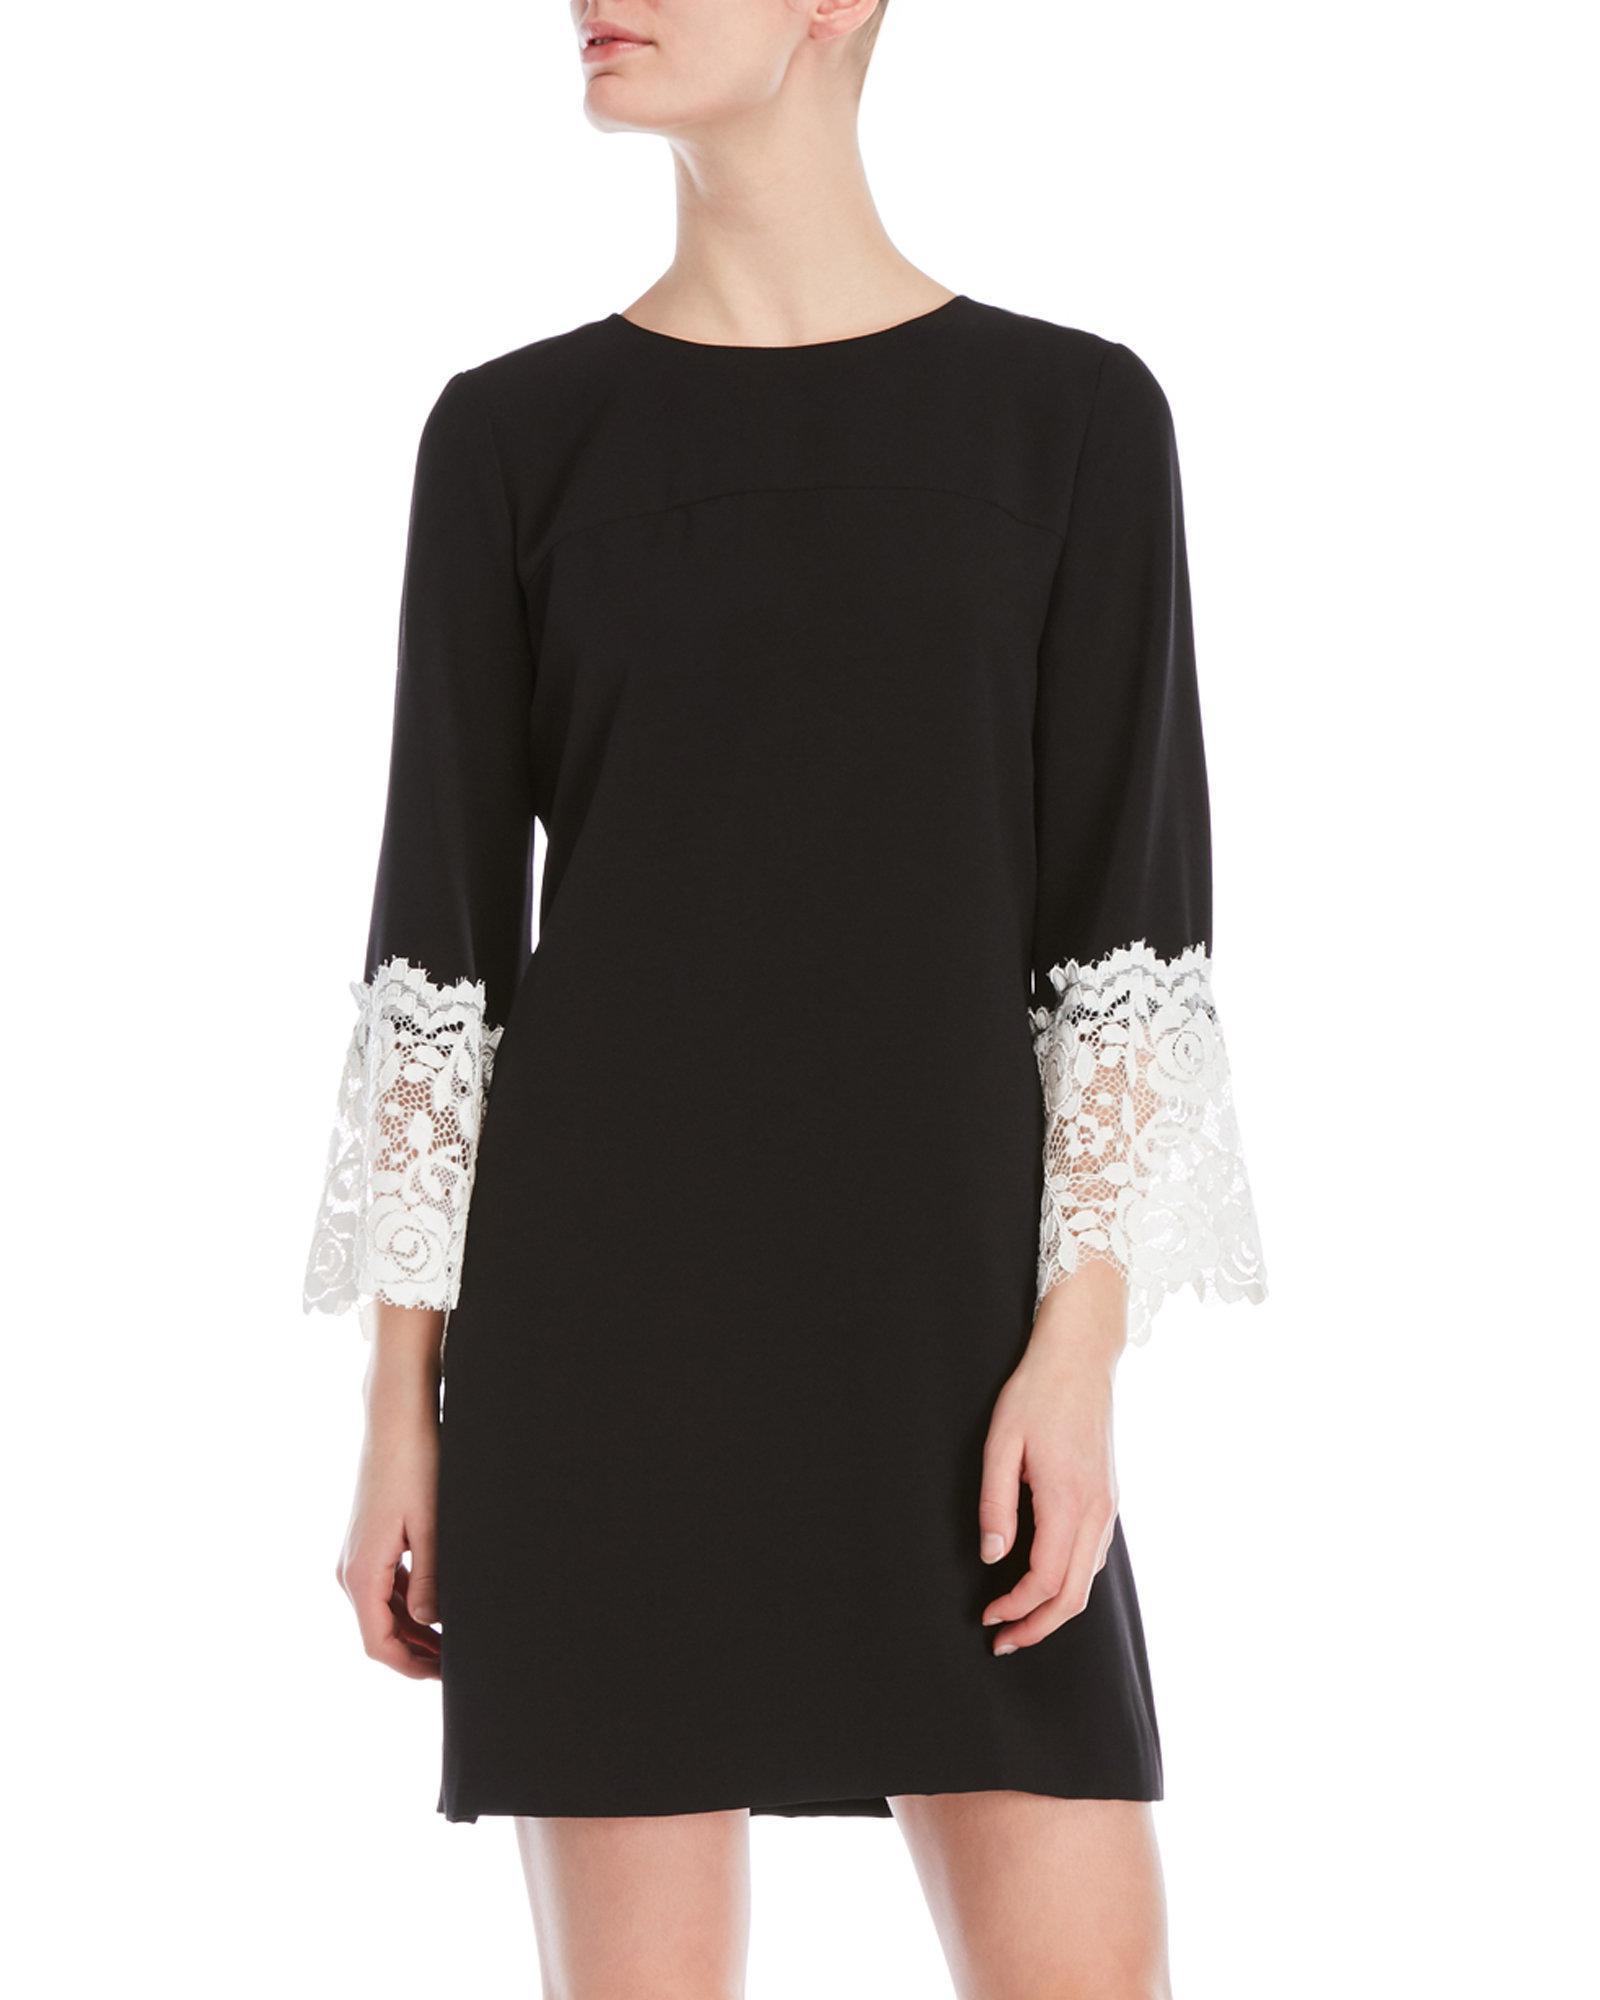 05e8fab6 Tahari Crepe Lace Bell Sleeve Dress in Black - Lyst